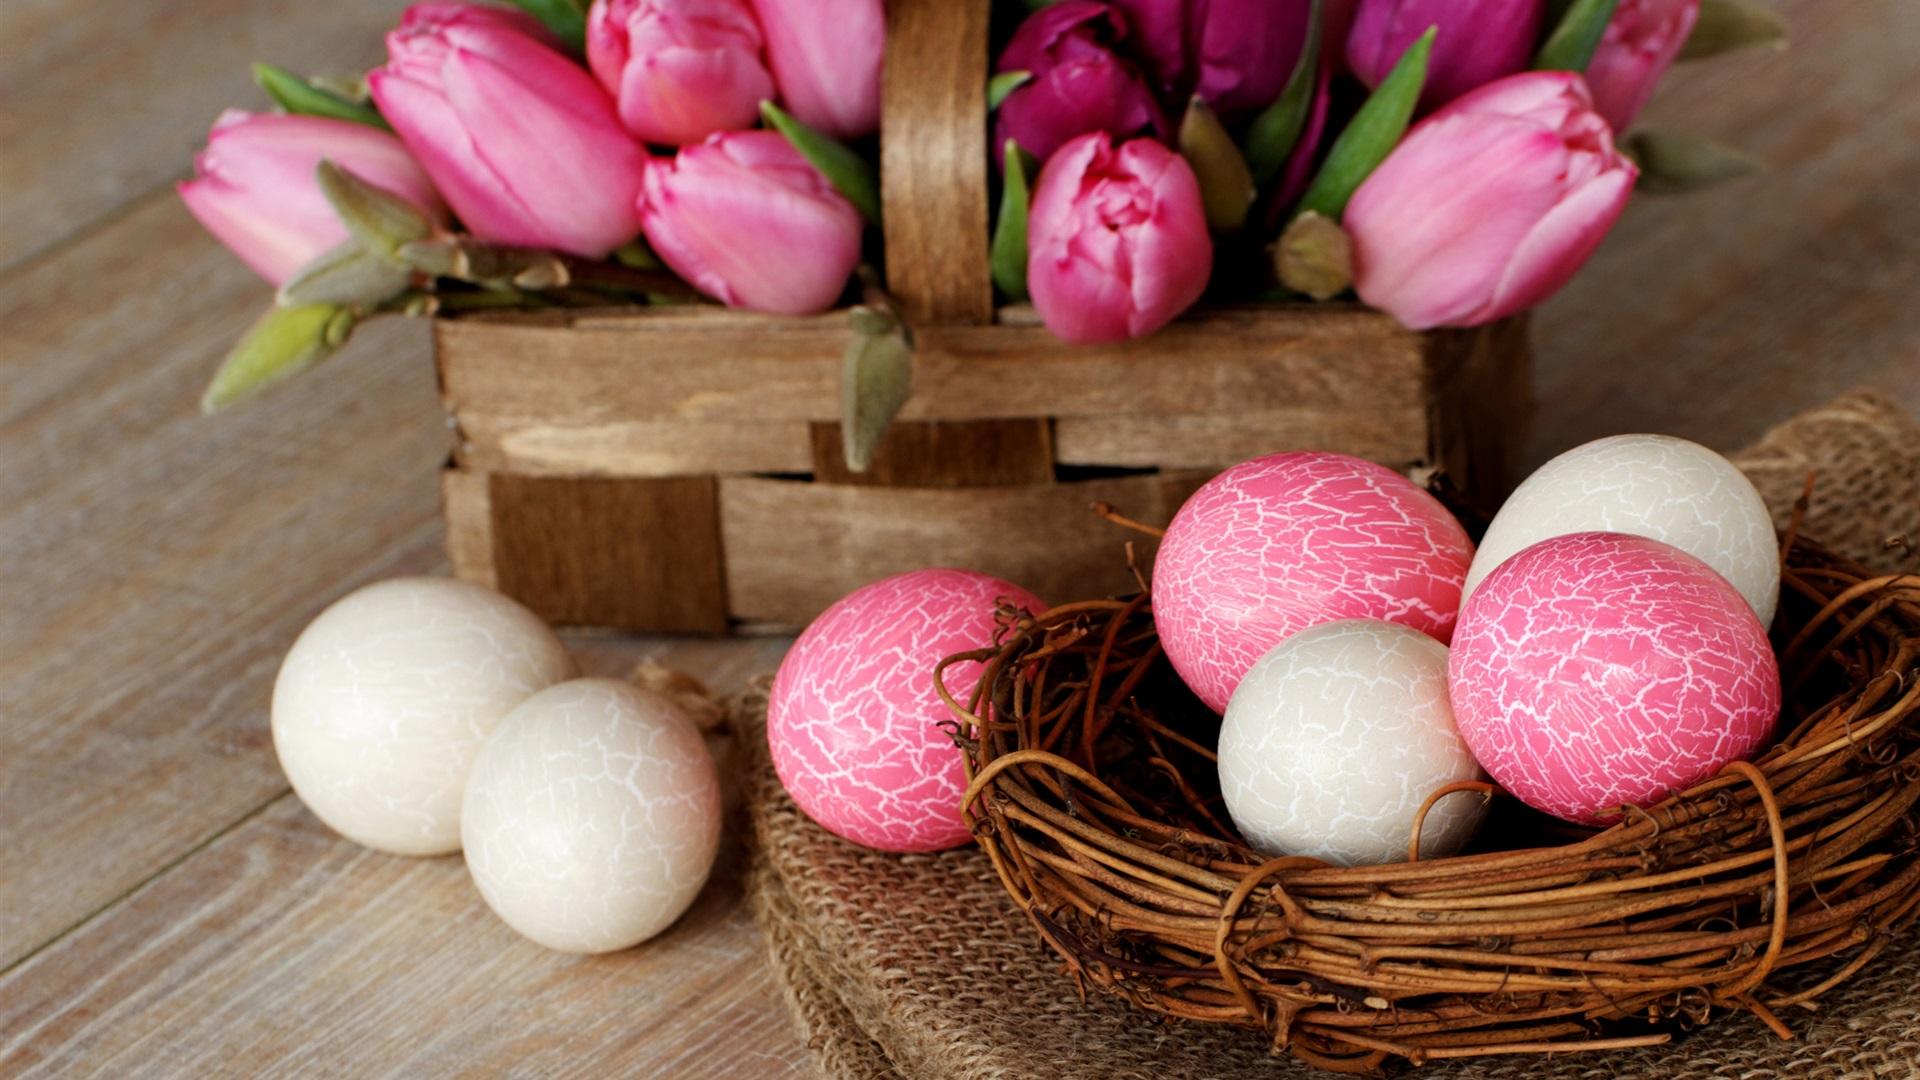 download hintergrundbilder 1920x1080 full hd ostern nest eier rosa wei tulpe blumen korb. Black Bedroom Furniture Sets. Home Design Ideas